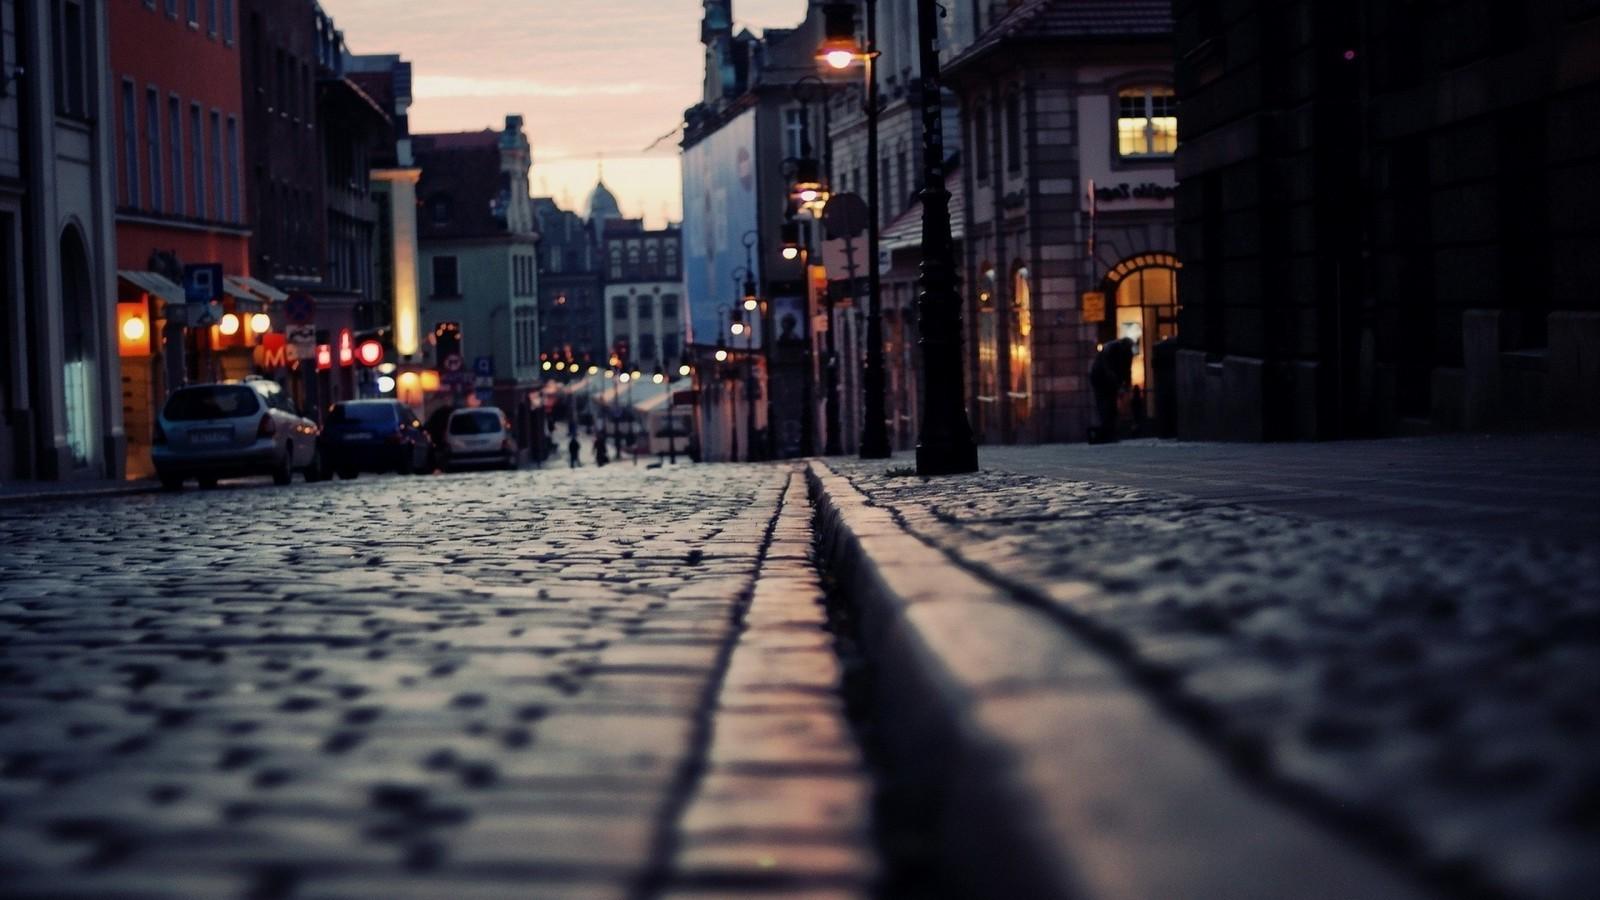 City street (1600x900)